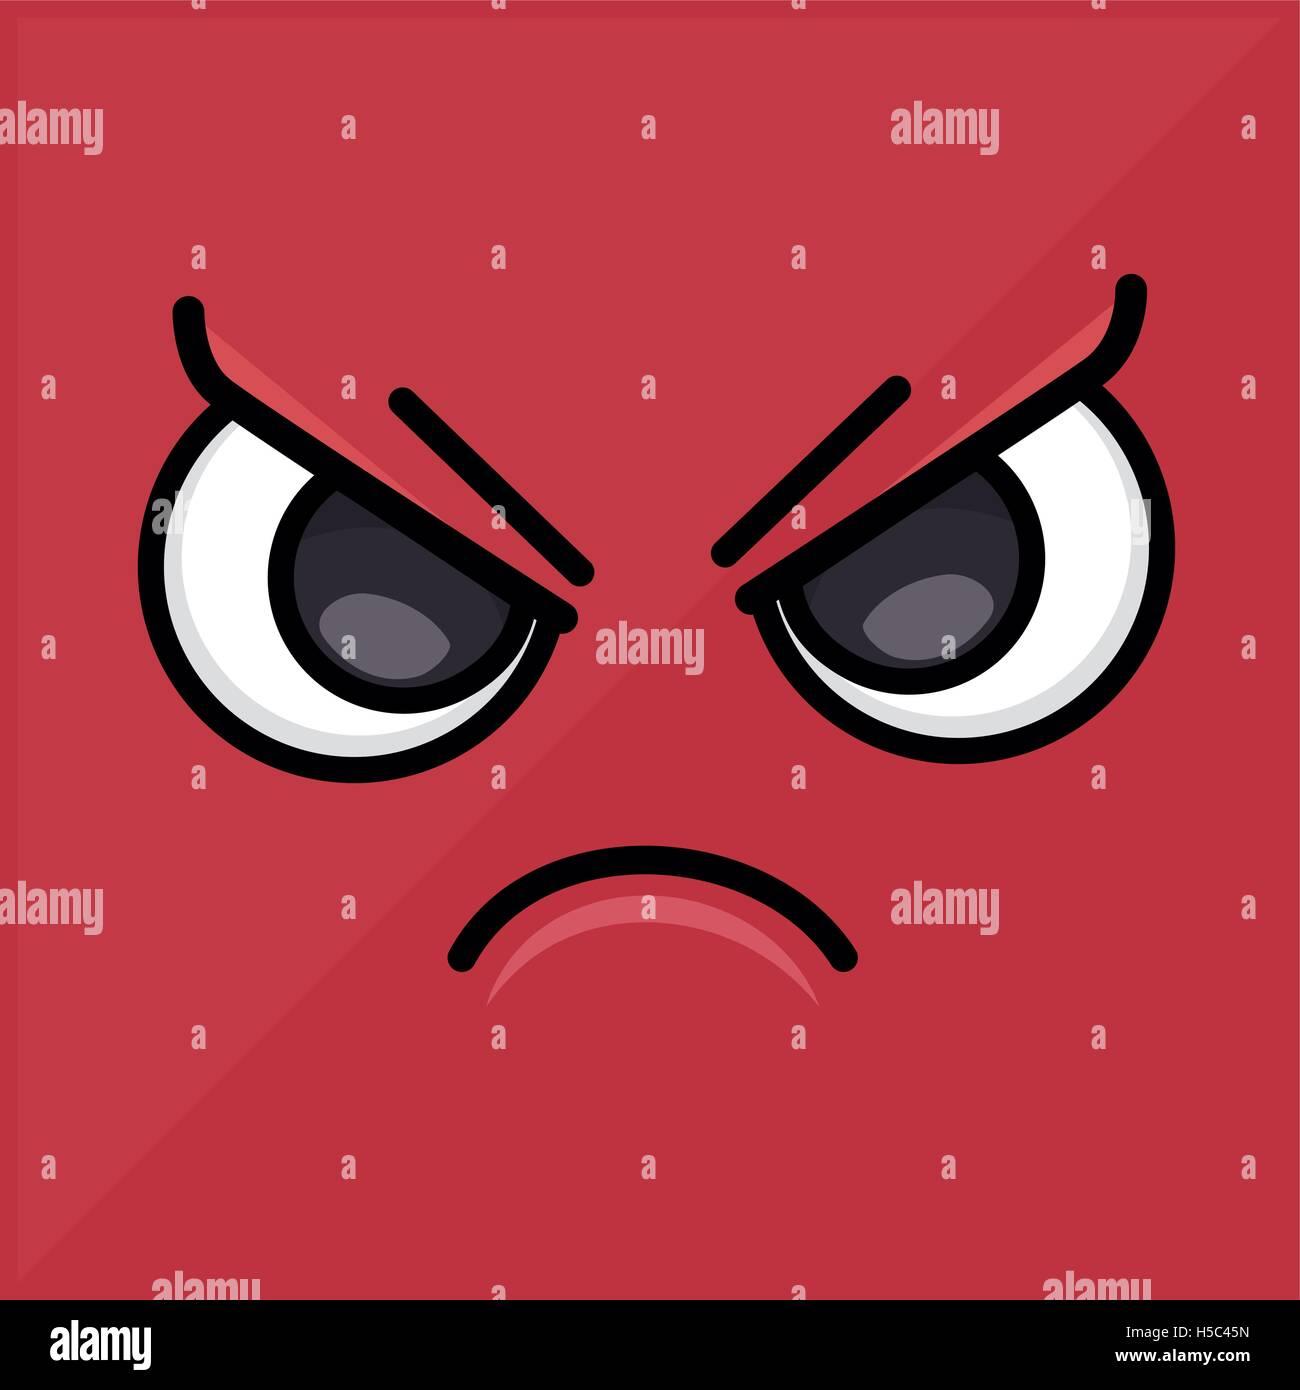 Angry wallpaper emoticon design icon stock vector art illustration angry wallpaper emoticon design icon altavistaventures Image collections